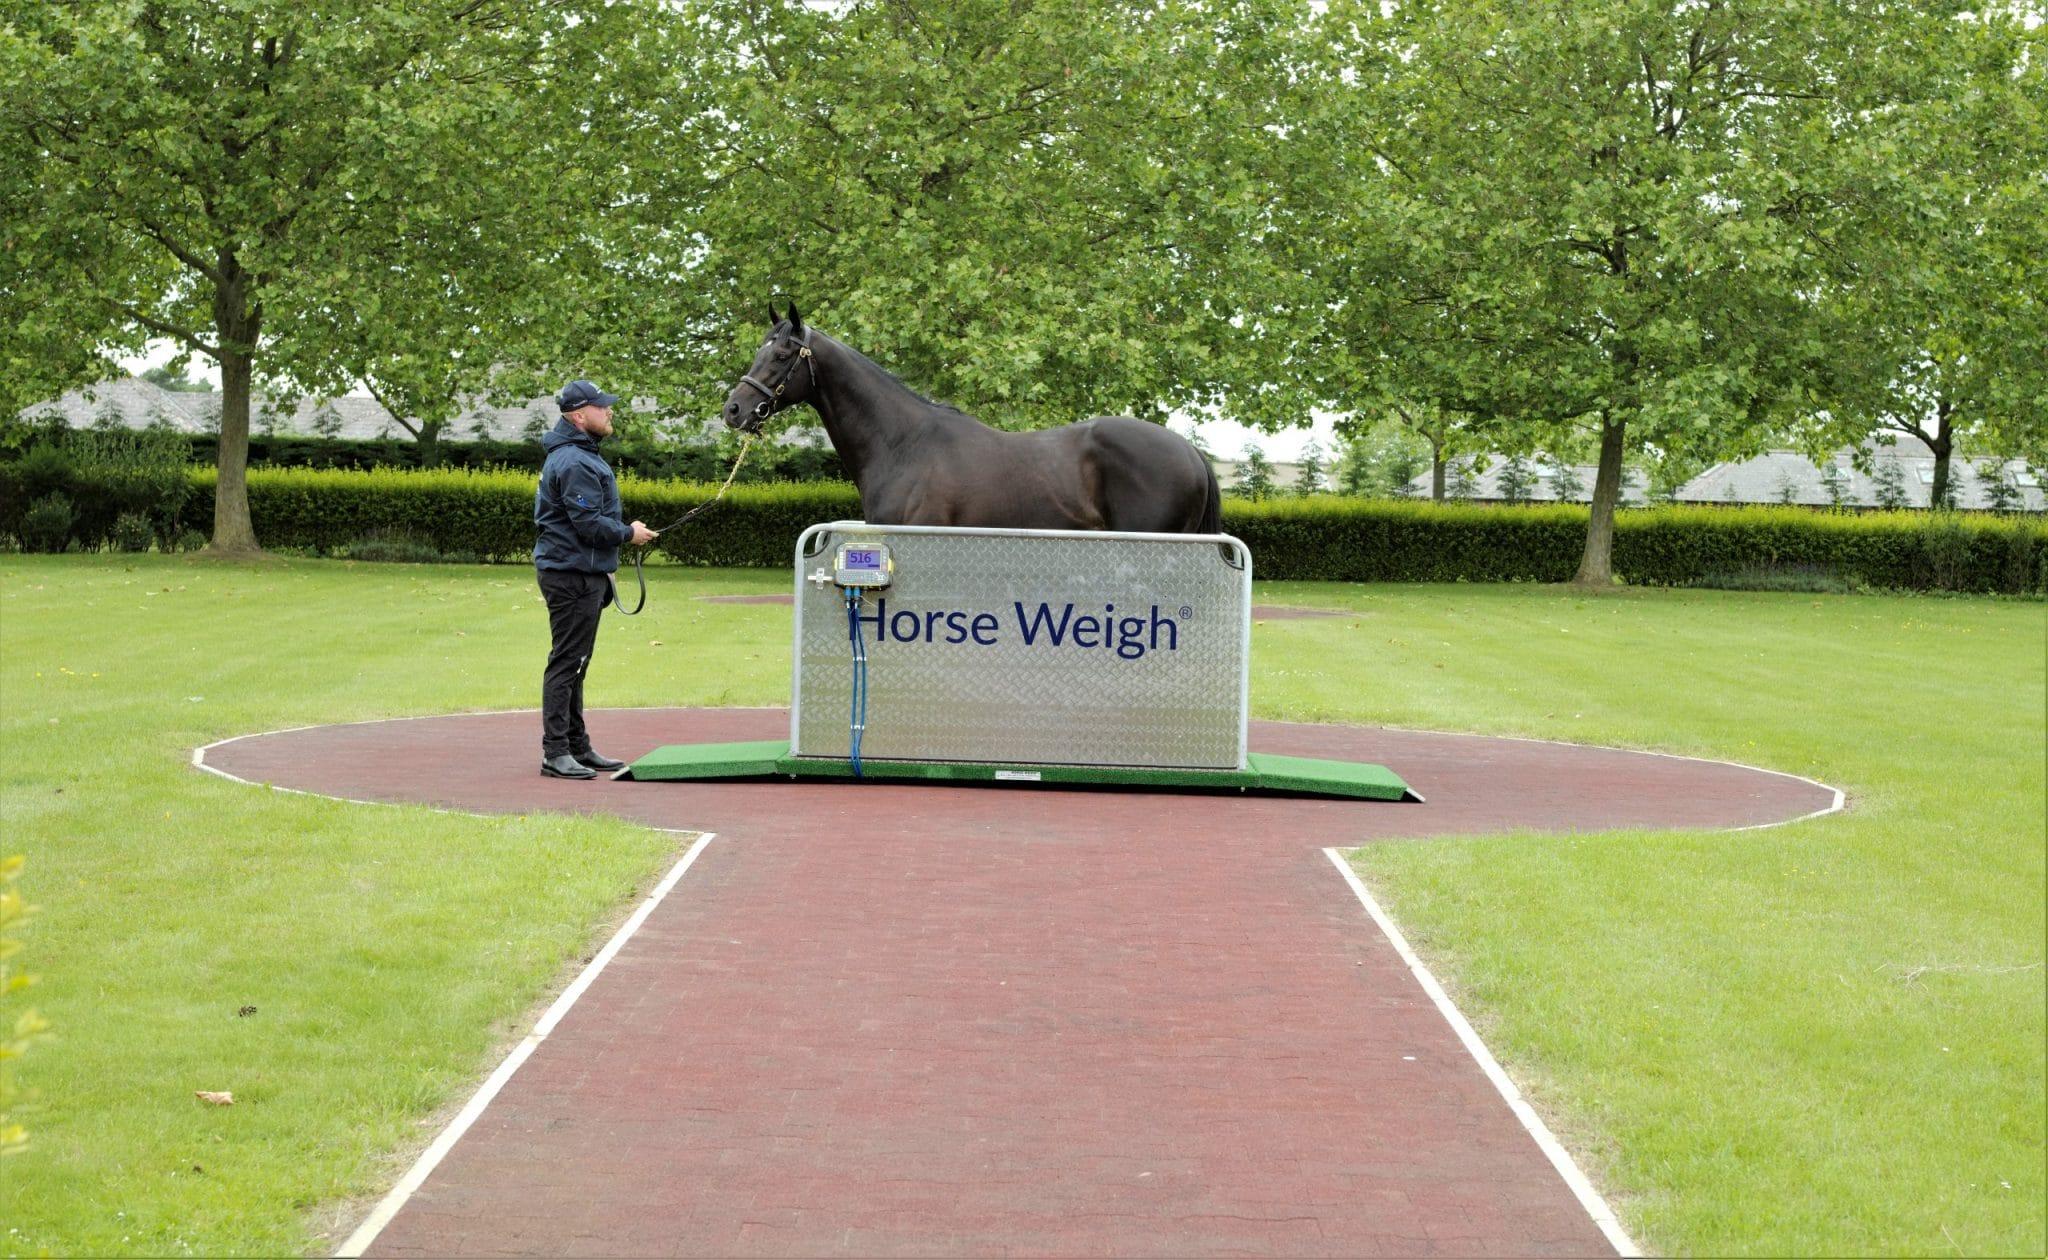 Olympic Horse Weighbridge